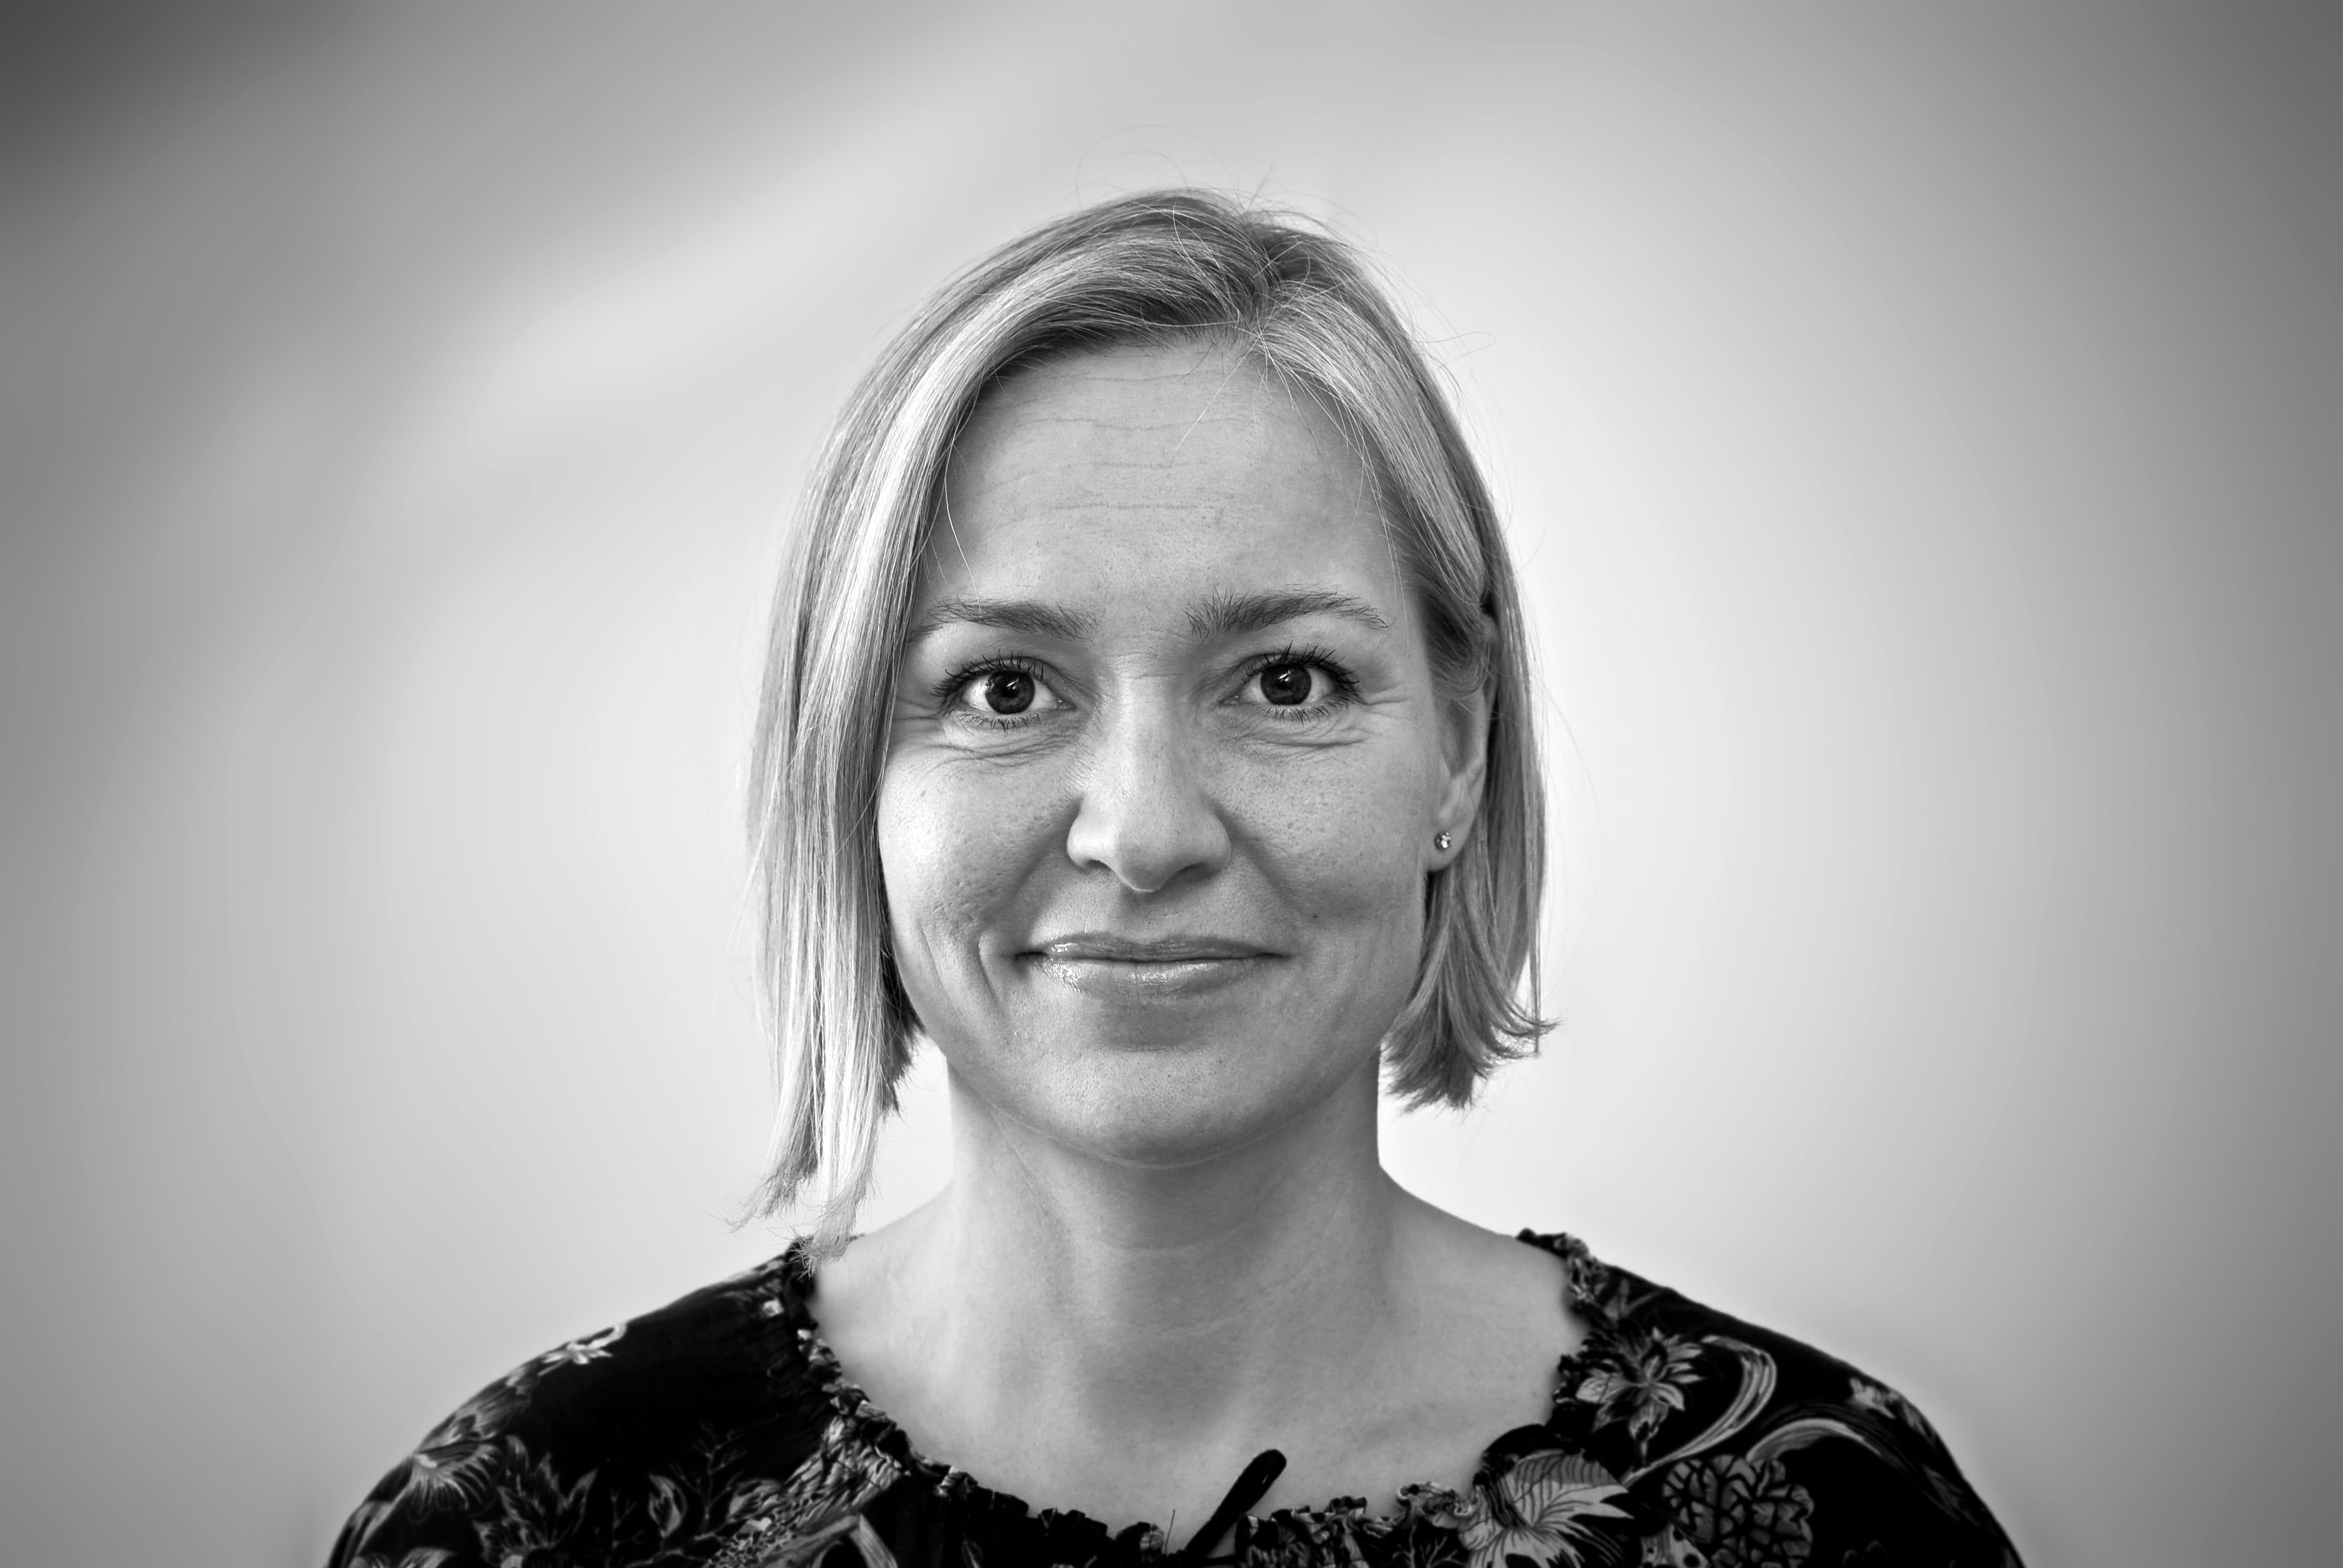 Lena Midtveit, Styreleder, IFPI Norge AS